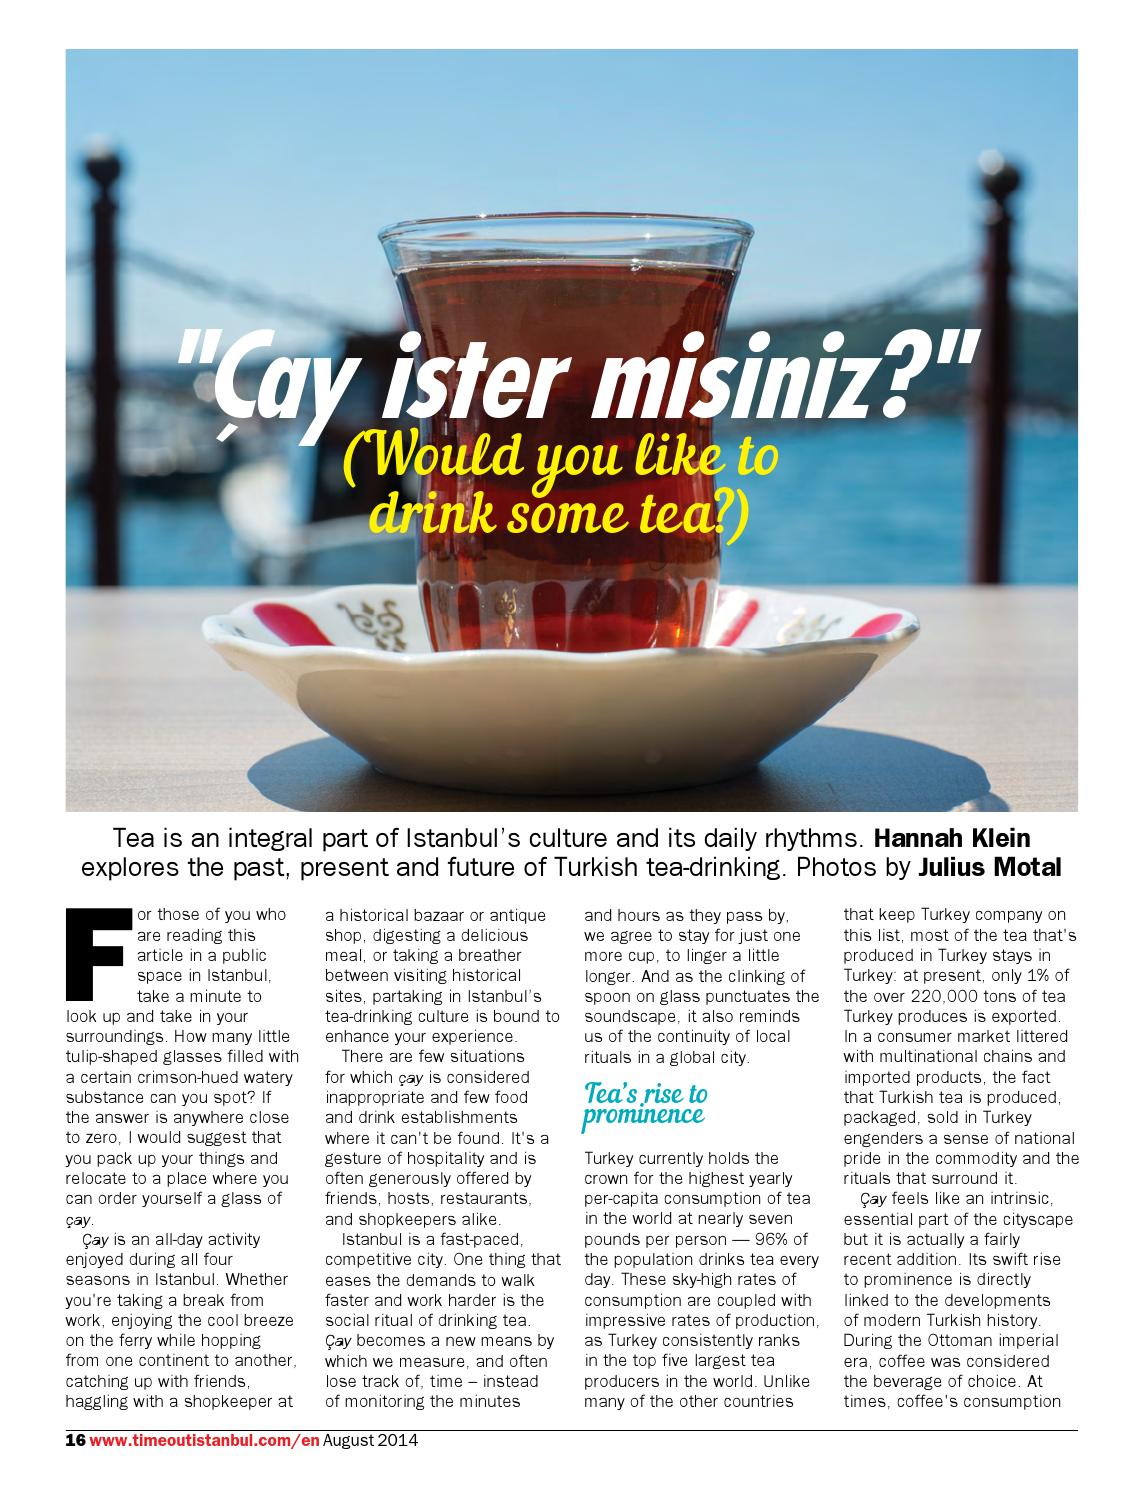 Tea toi august 2014 by Julius Motal - issuu